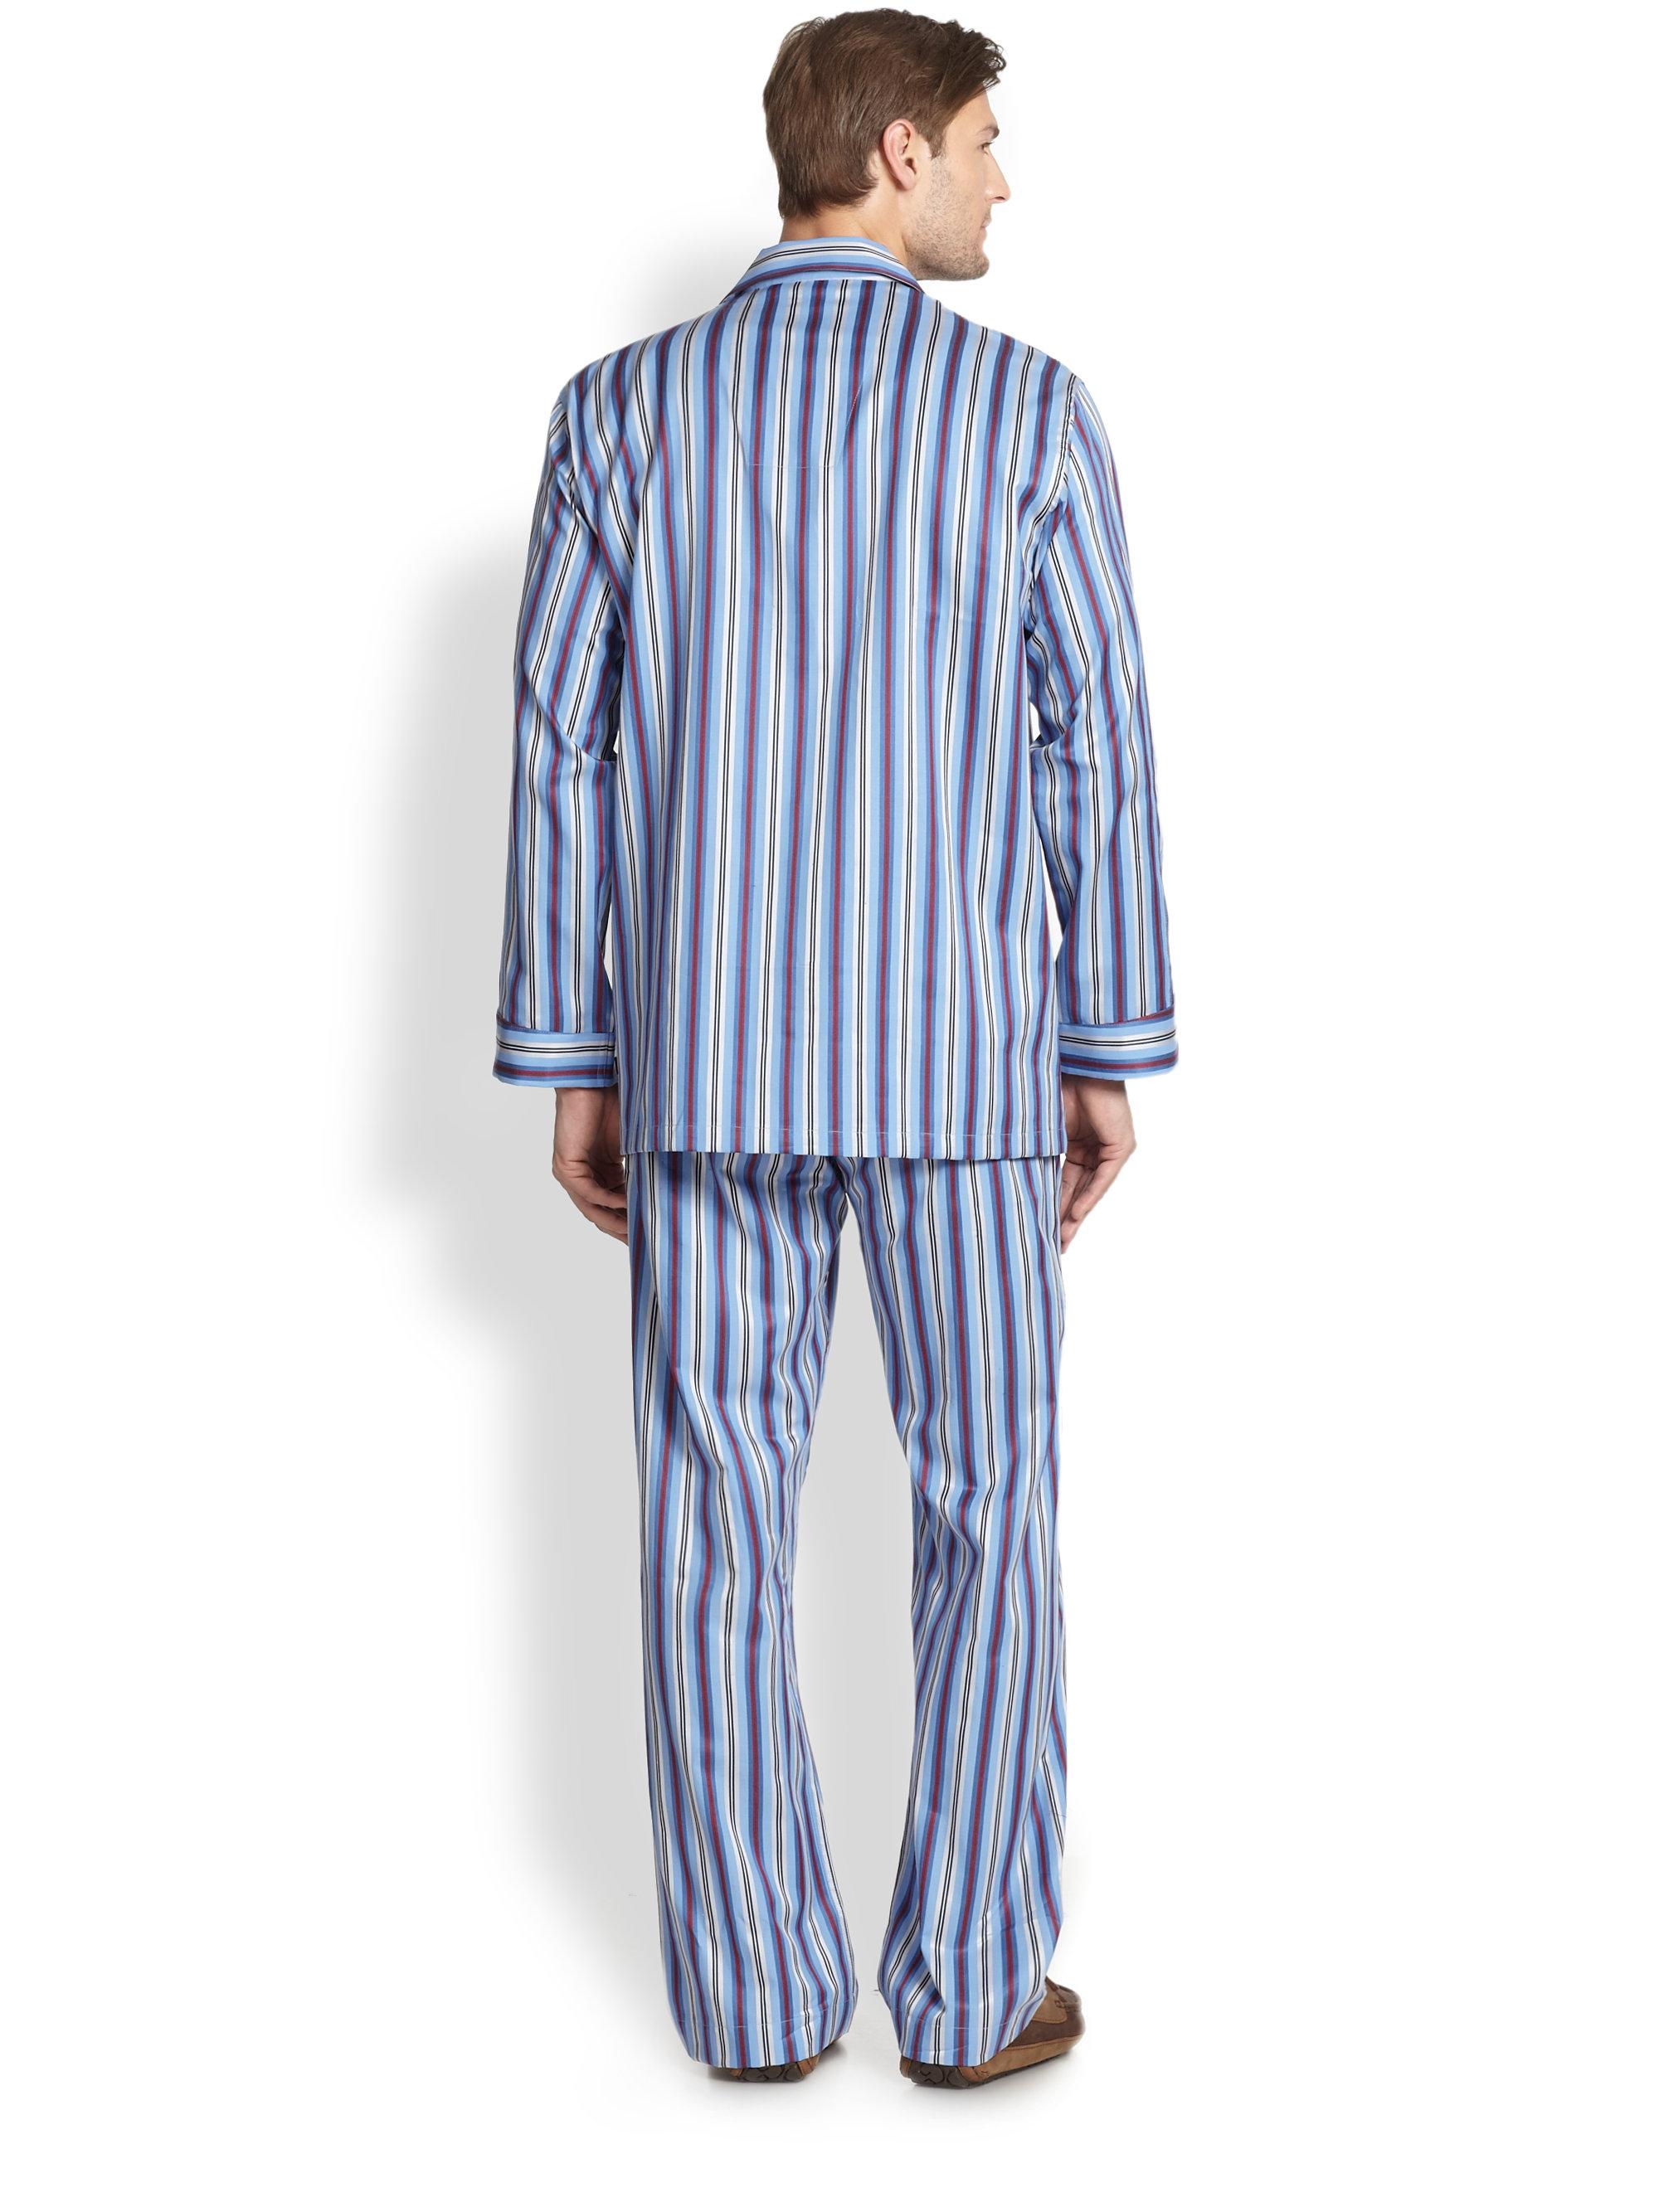 Mens Striped Pajamas - Breeze Clothing